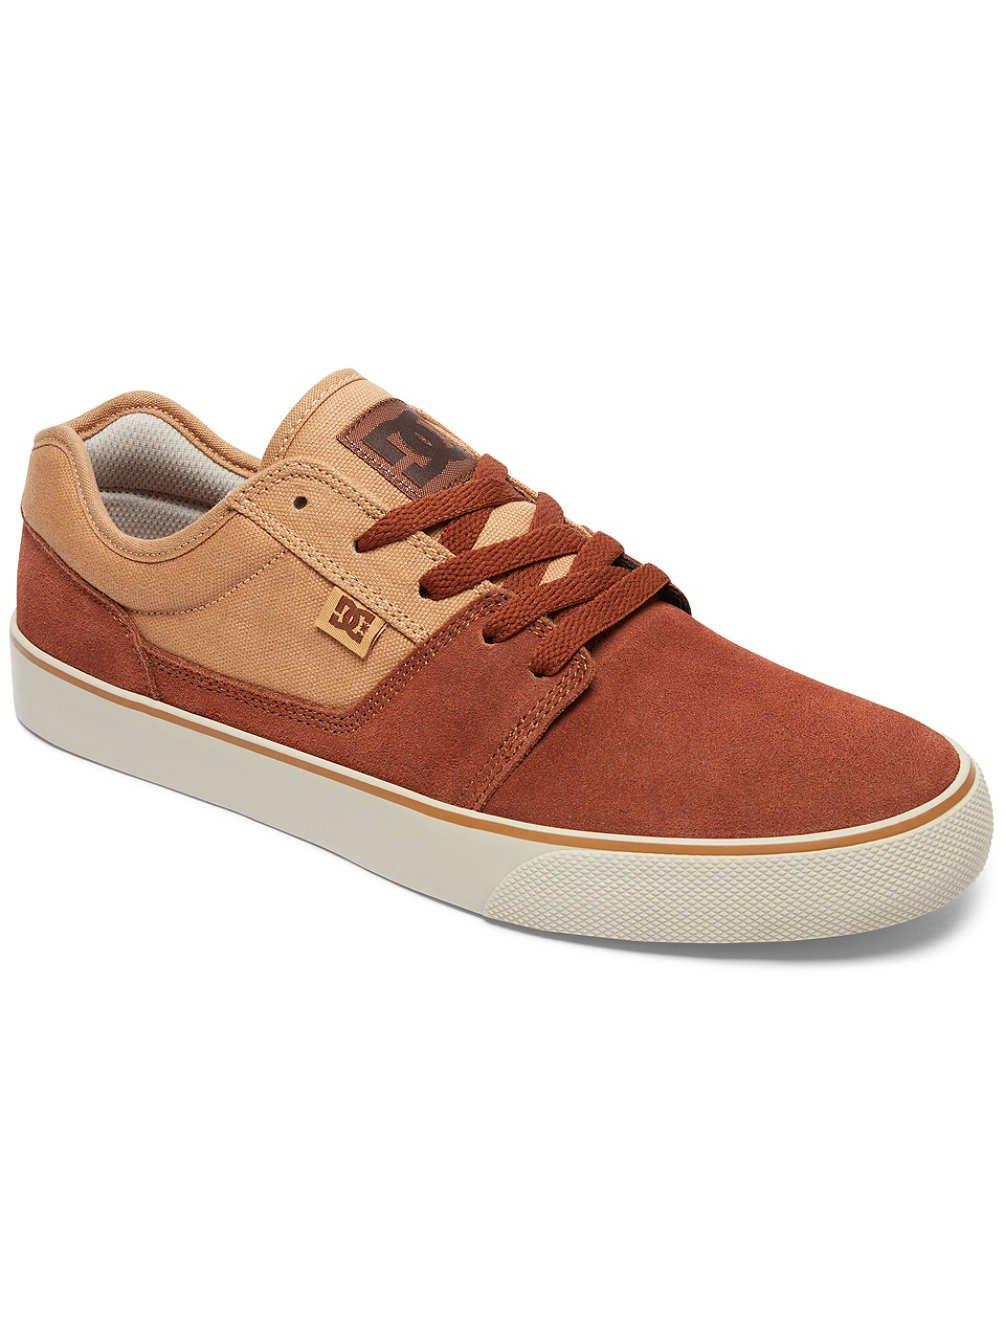 DC TONIK Unisex-Erwachsene Sneakers  10.5|Tobacco